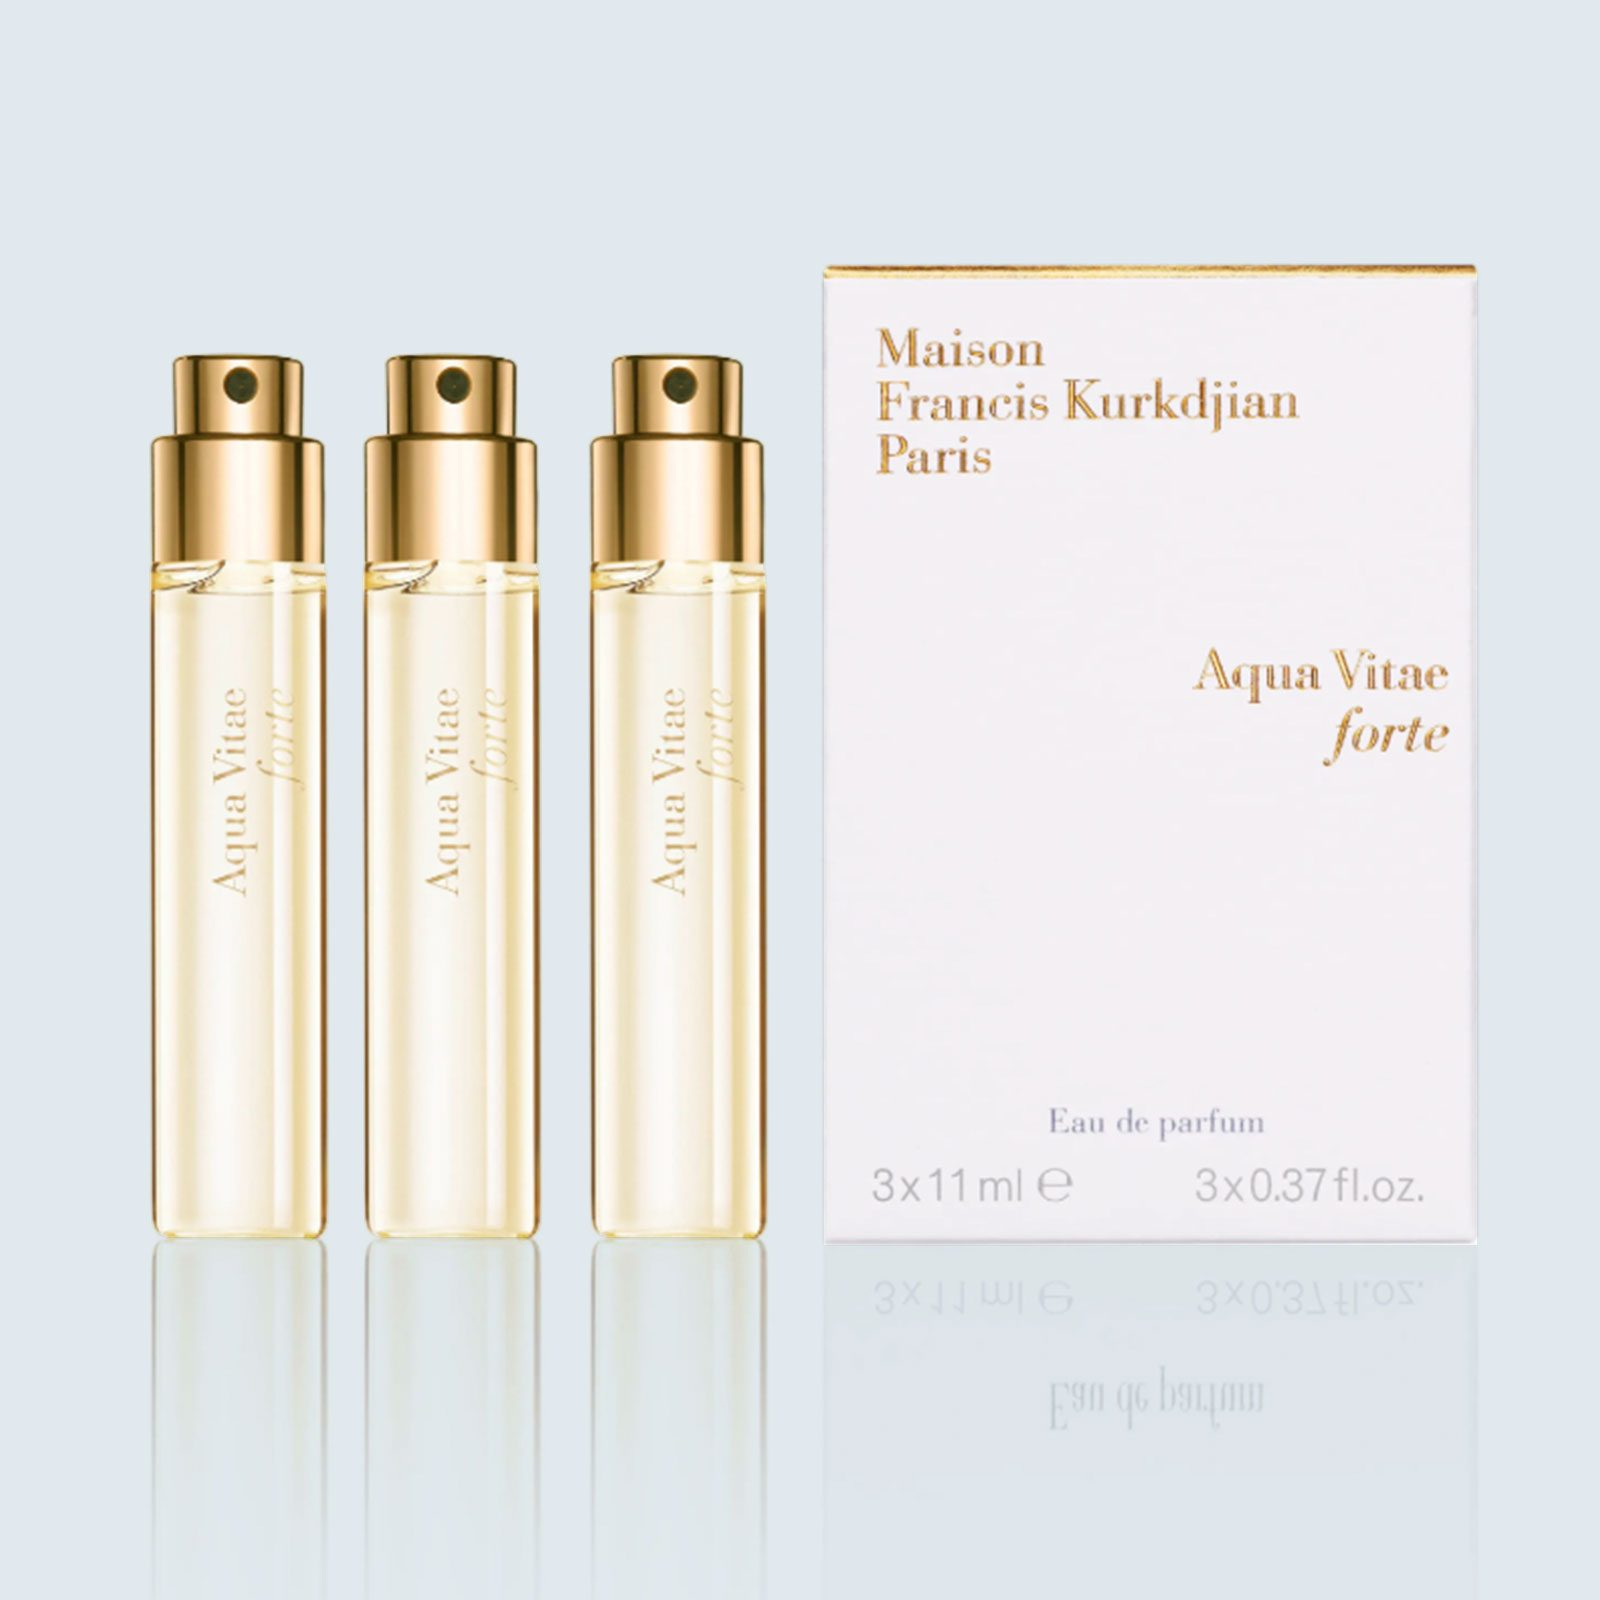 Maison Francis Kurkdjian Paris Aqua Vitae Forte Eau de Parfum